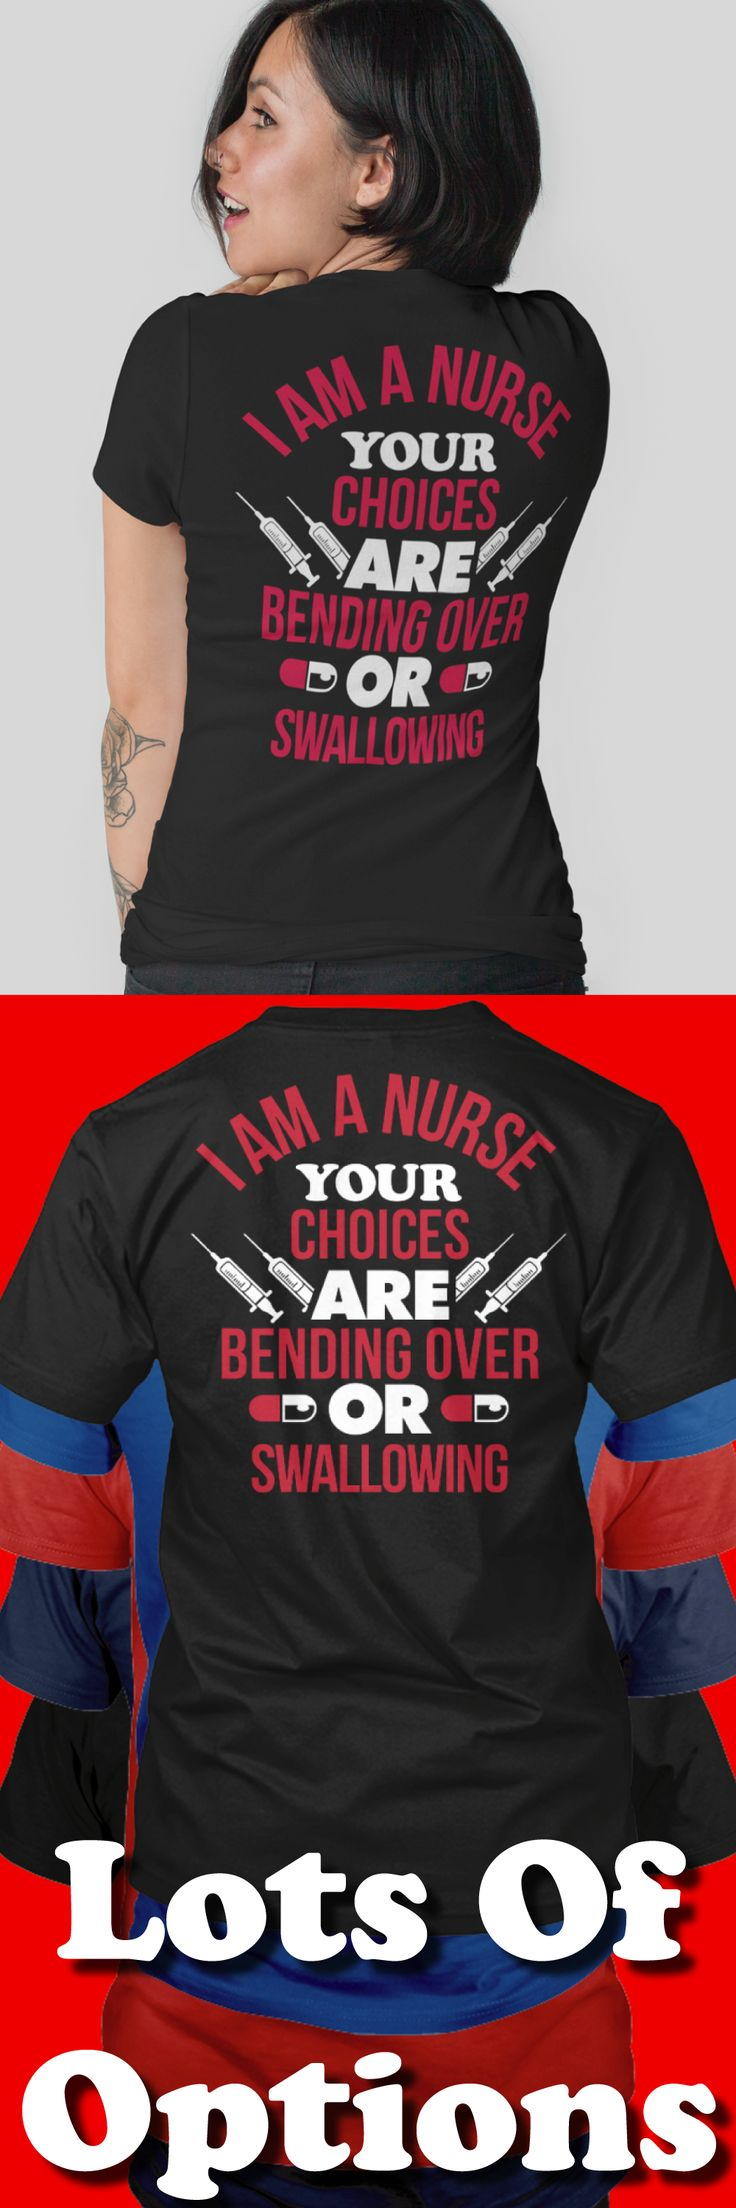 Nurse Shirt: Are You A Nurse? Love Being A Nurse? Wear Nurse Shirts? Great Nurses Gift! Lots Of Sizes & Colors. Like Nurses, Scrubs, Awesome Nurse, Funny Nurse Shirts and the Nursing Life? Strict Limit Of 5 Shirts! Treat Yourself & Click Now!  https://teespring.com/KG57-433